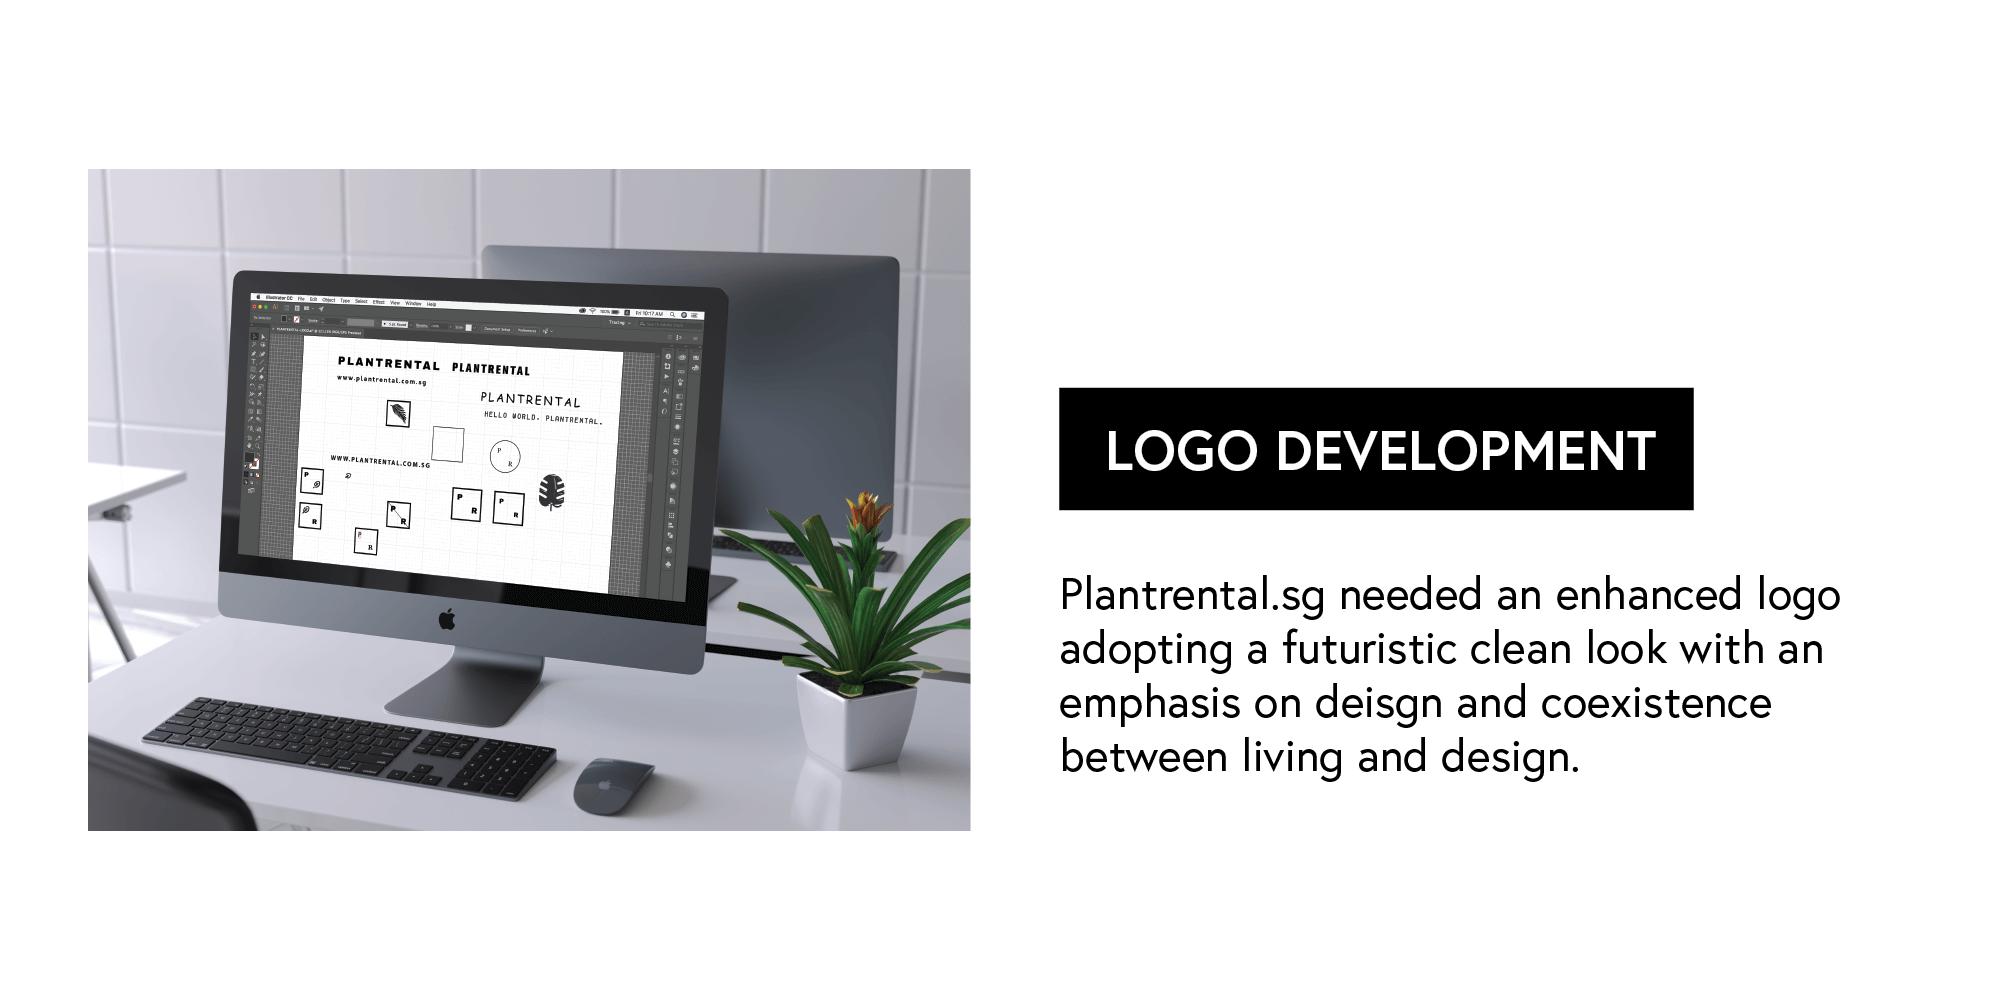 PR Logo Development 1